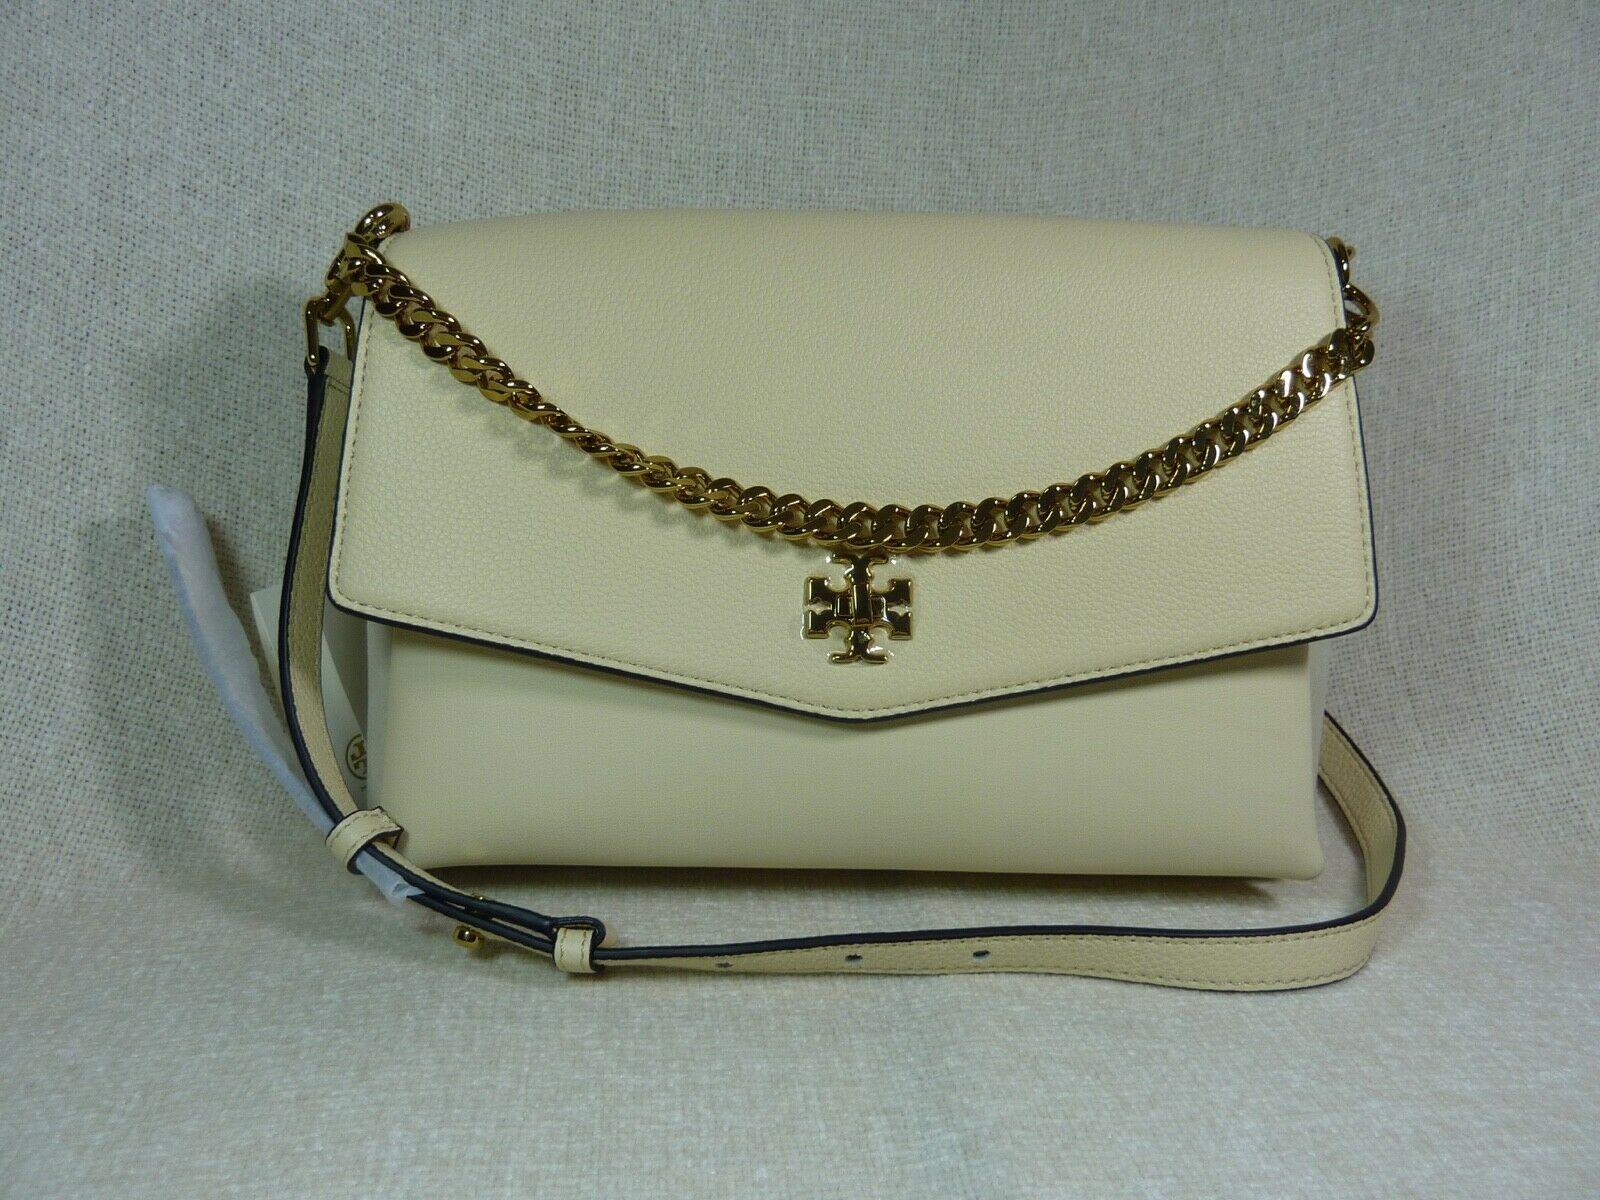 NWT Tory Burch New Cream KIRA Mixed-material Double-strap Shoulder Bag $528